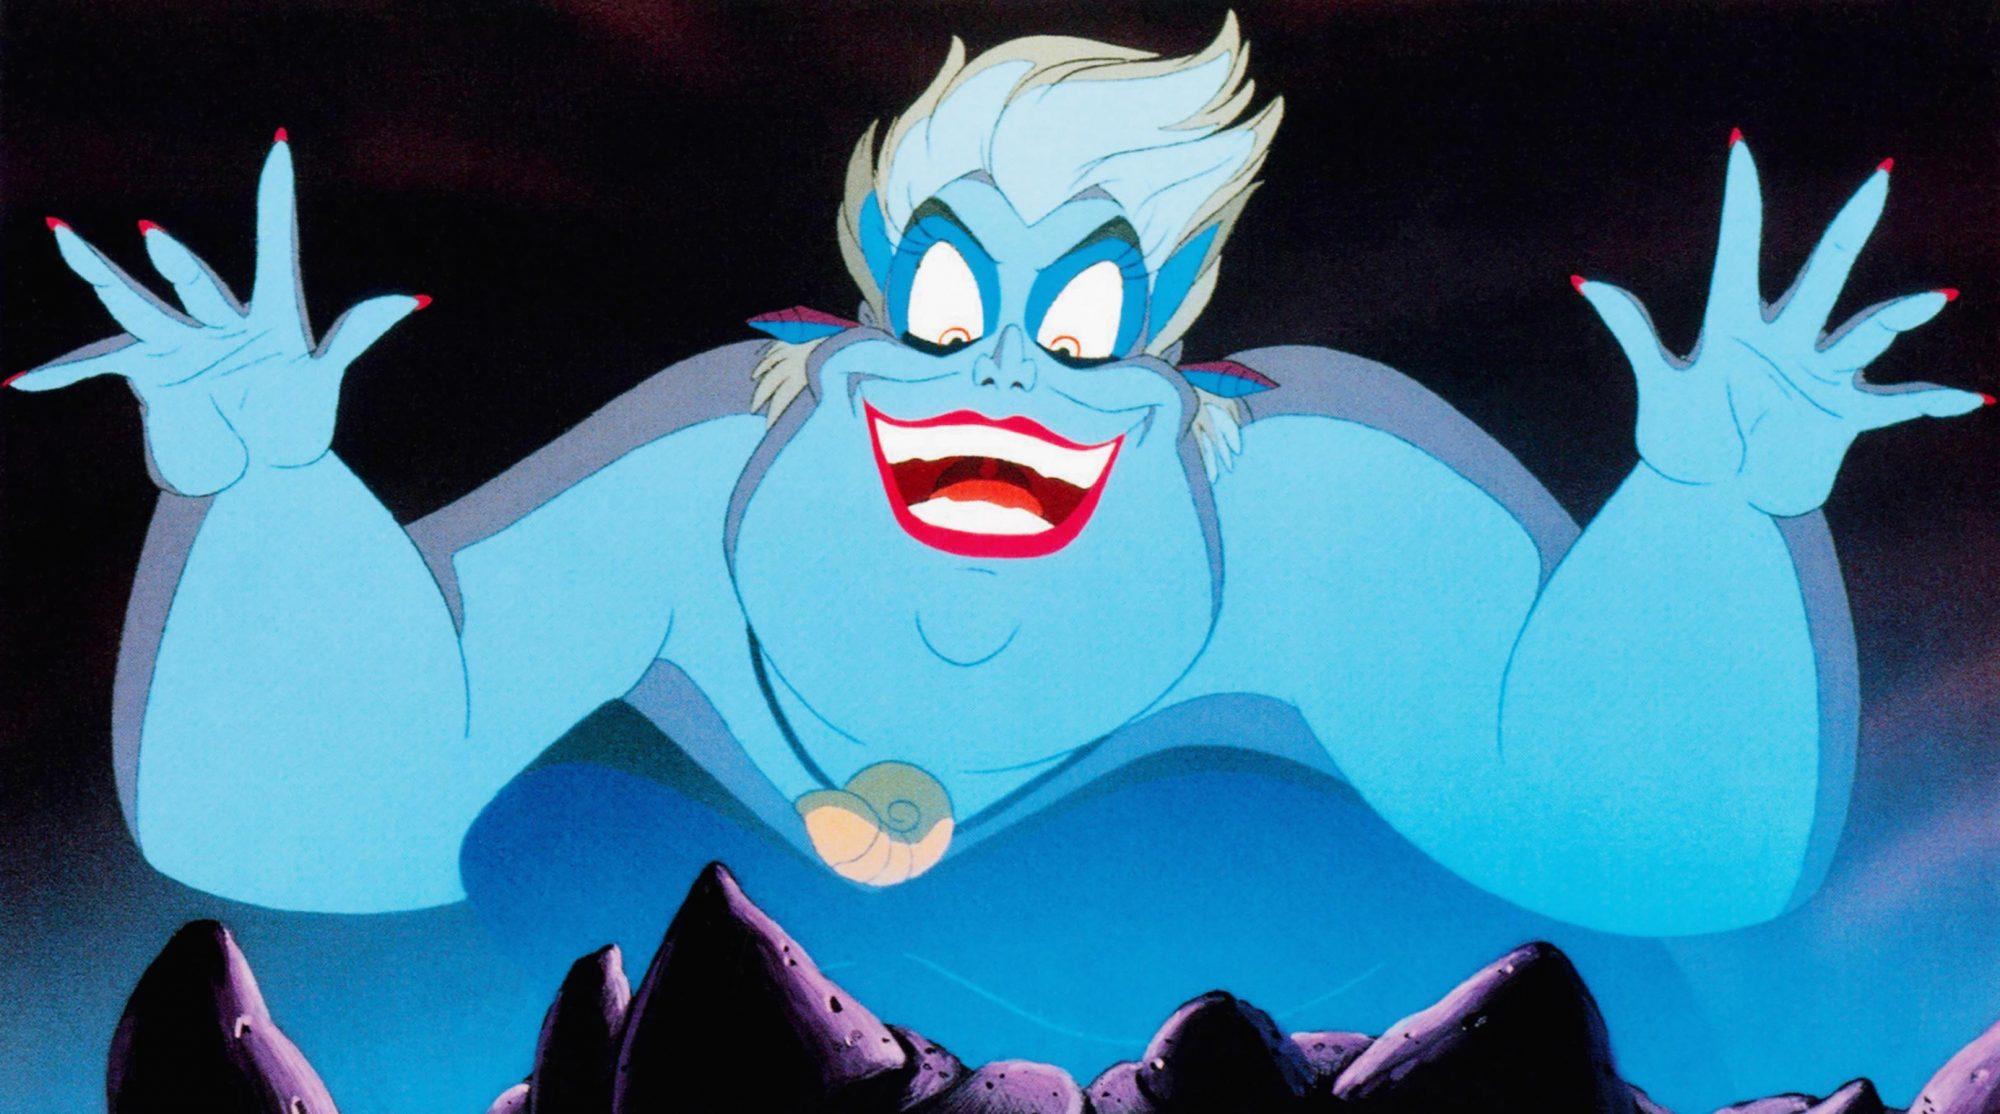 THE LITTLE MERMAID, Ursula, 1989, © Walt Disney/courtesy Everett Collection